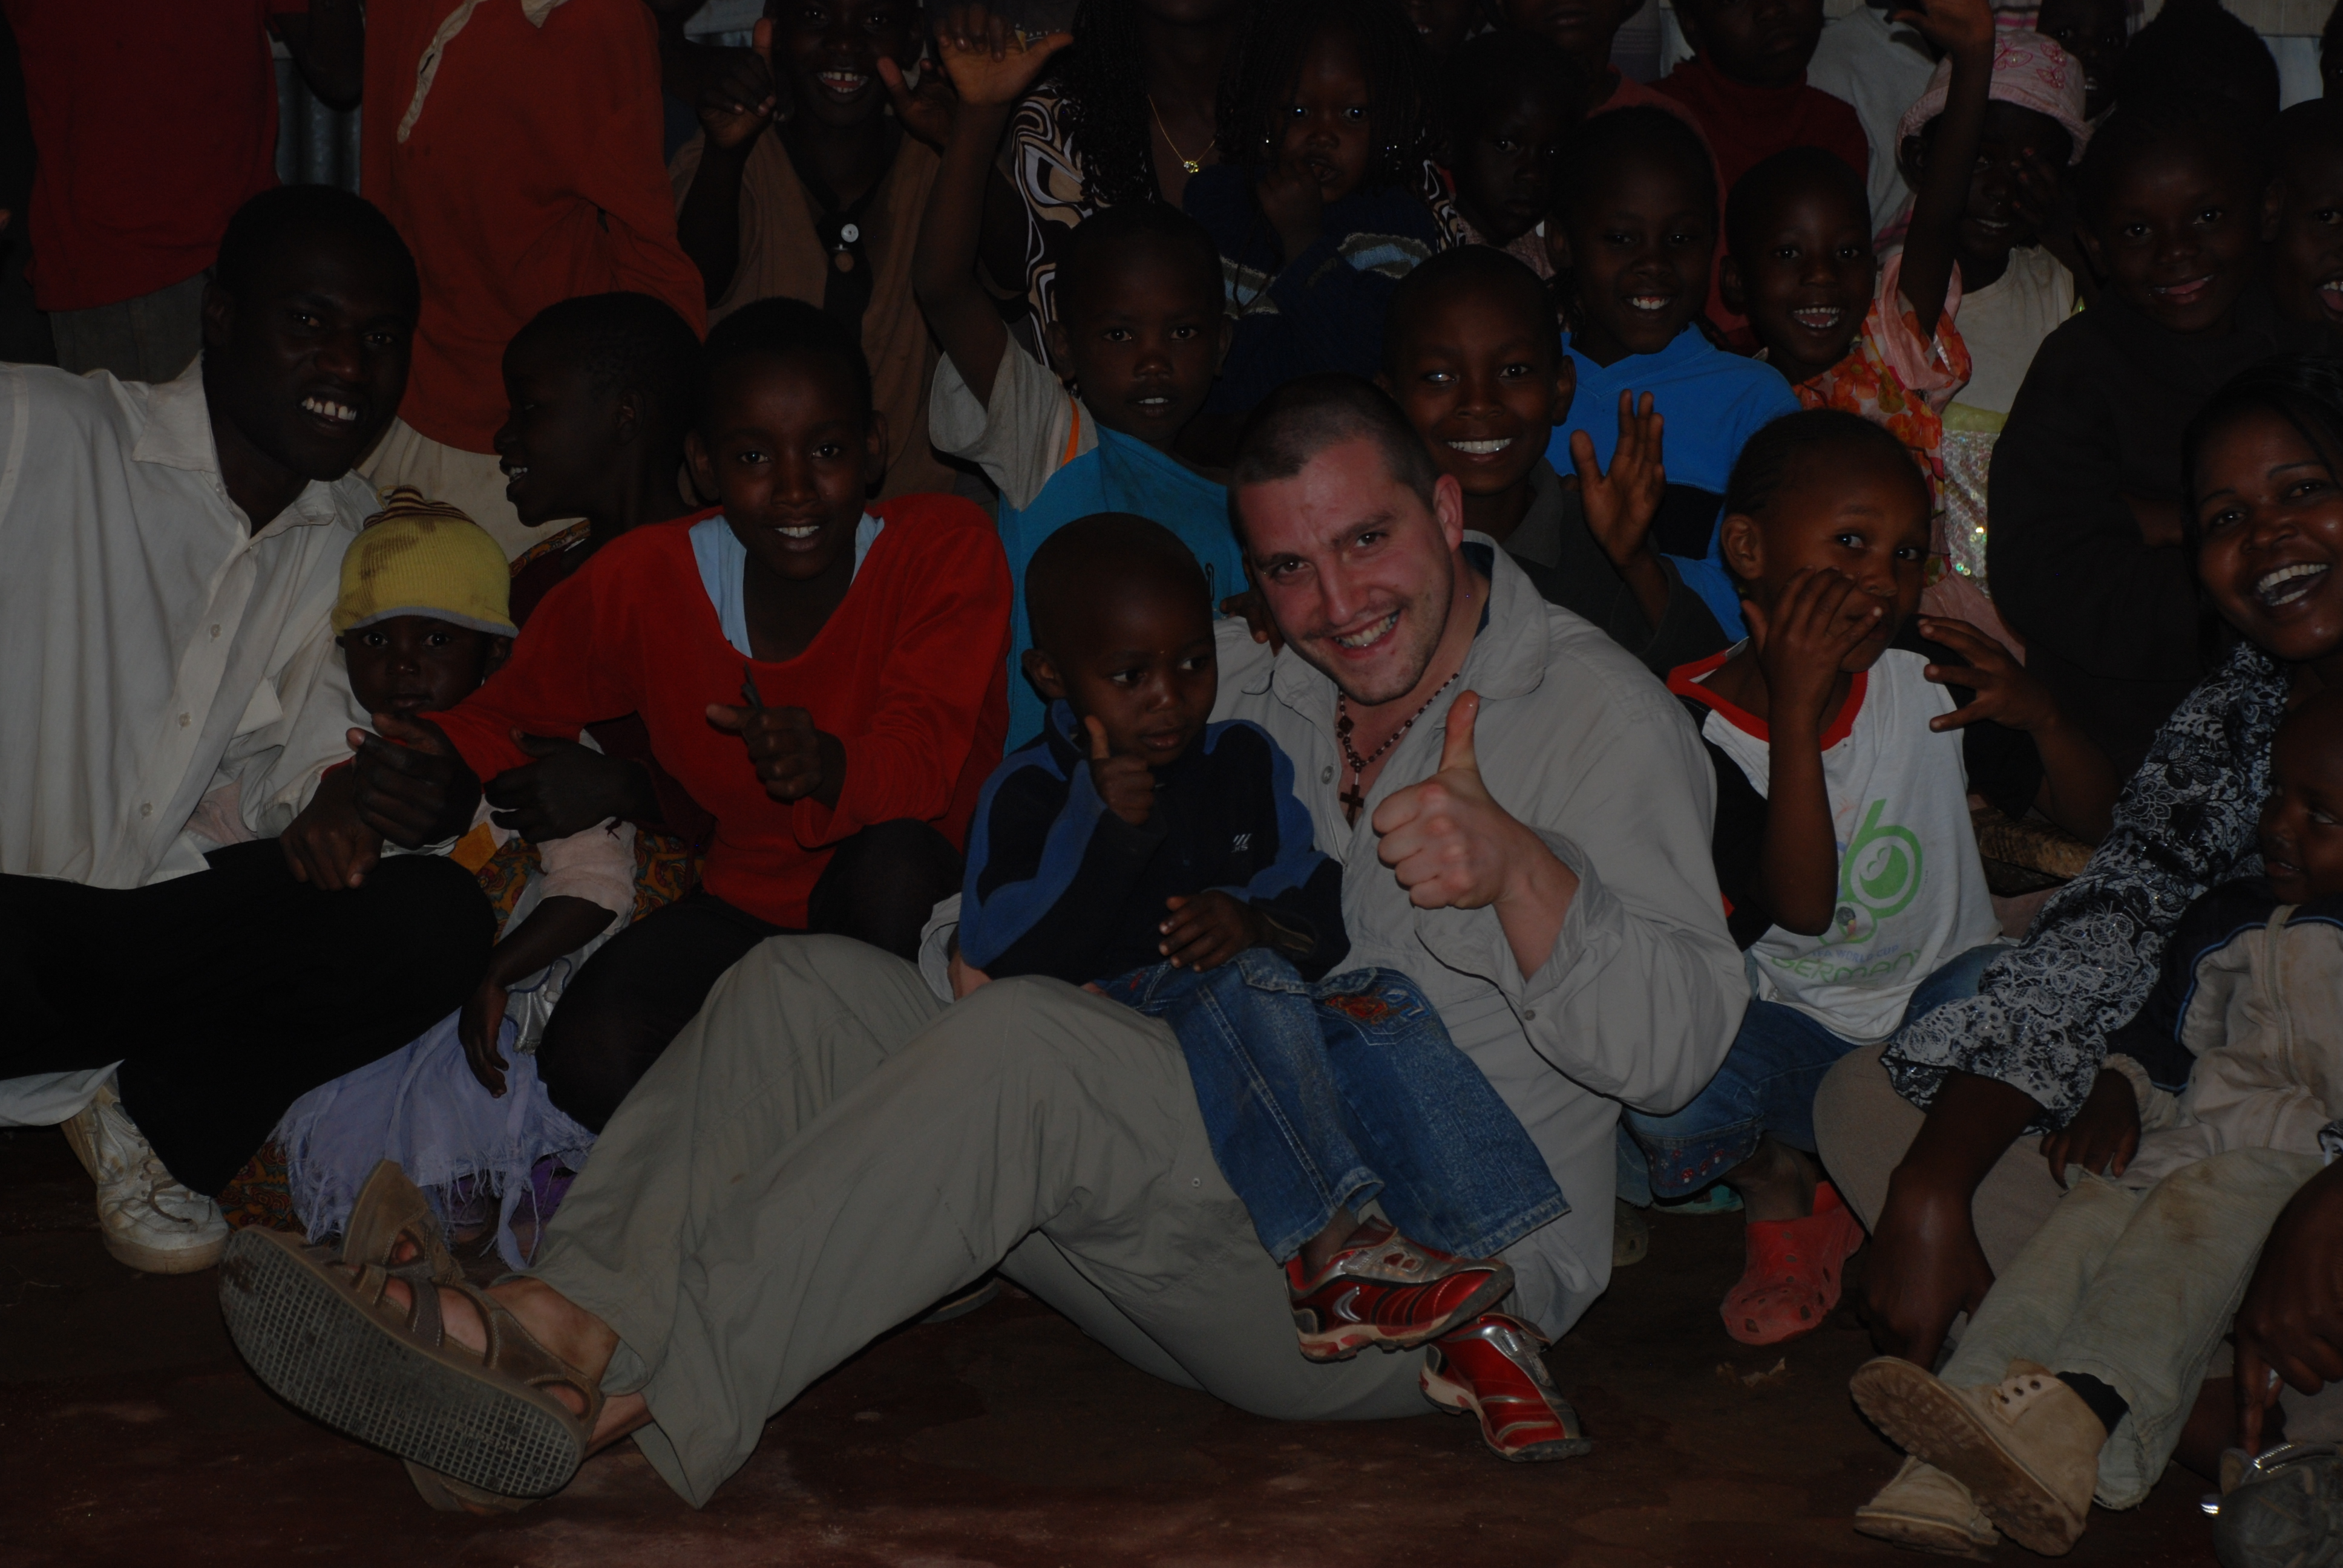 African trip Slideshow!